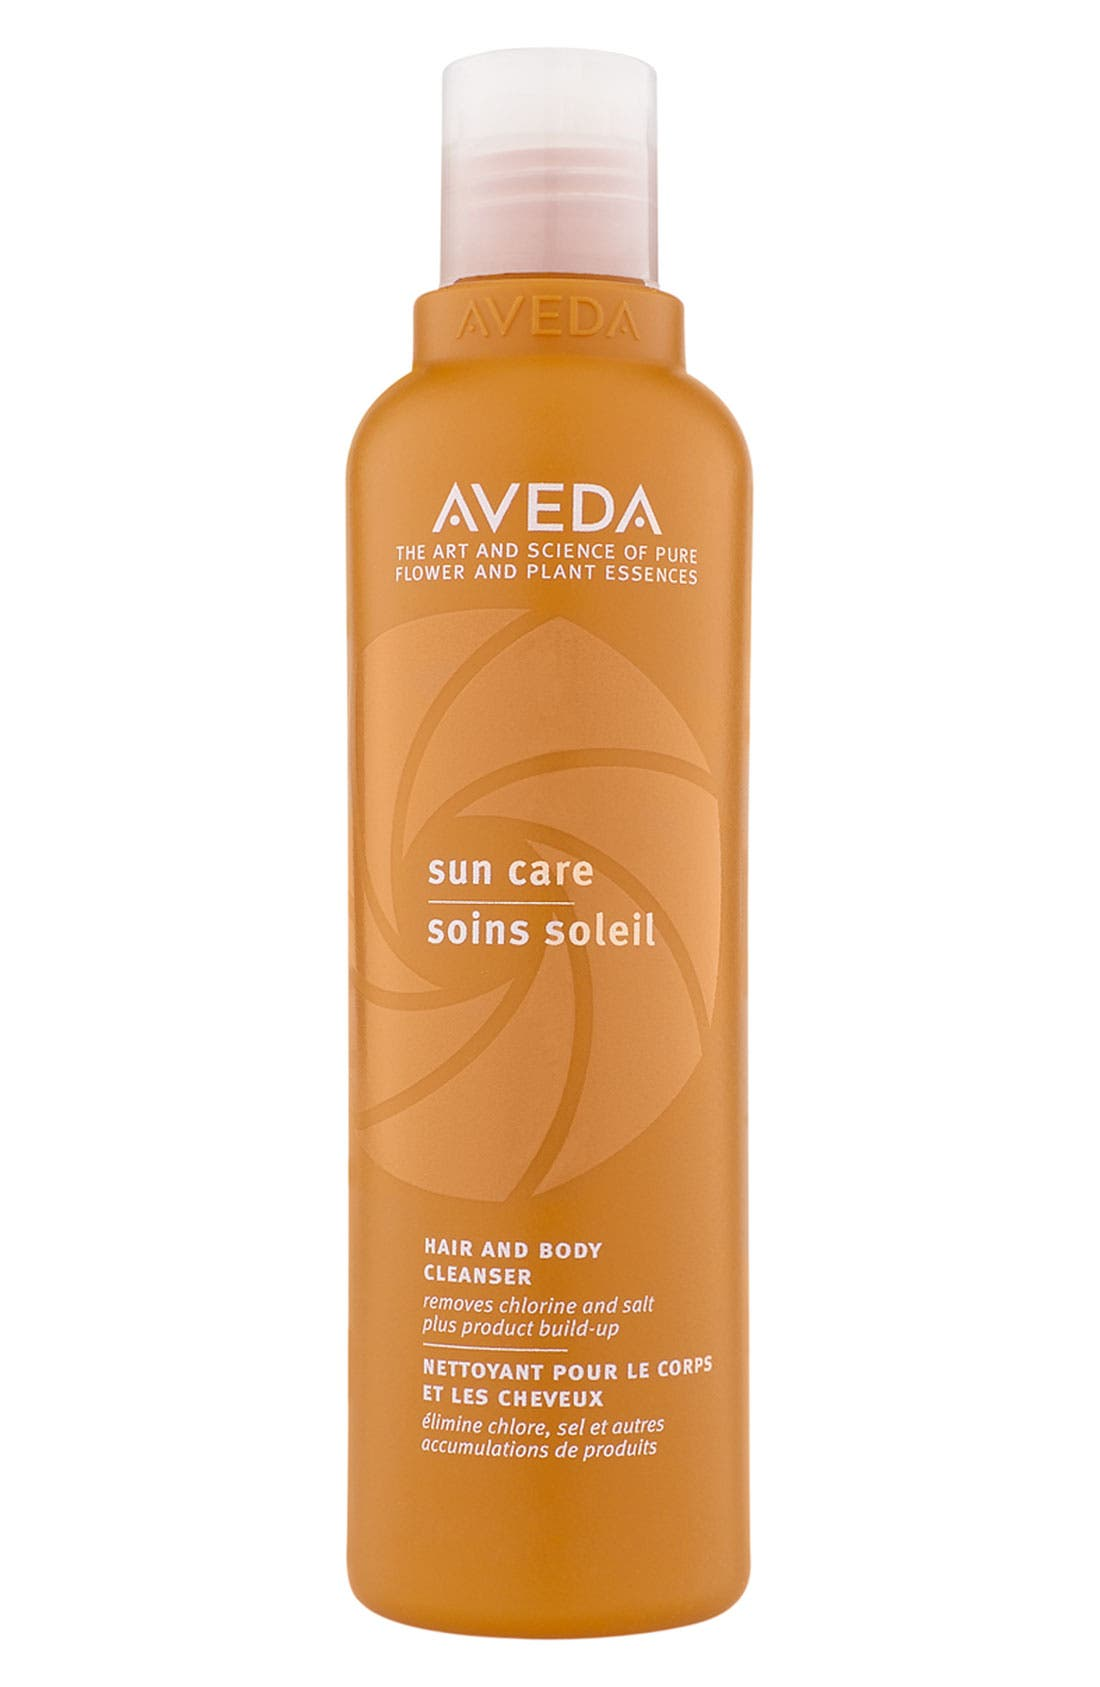 Aveda 'Sun Care' Hair & Body Cleanser